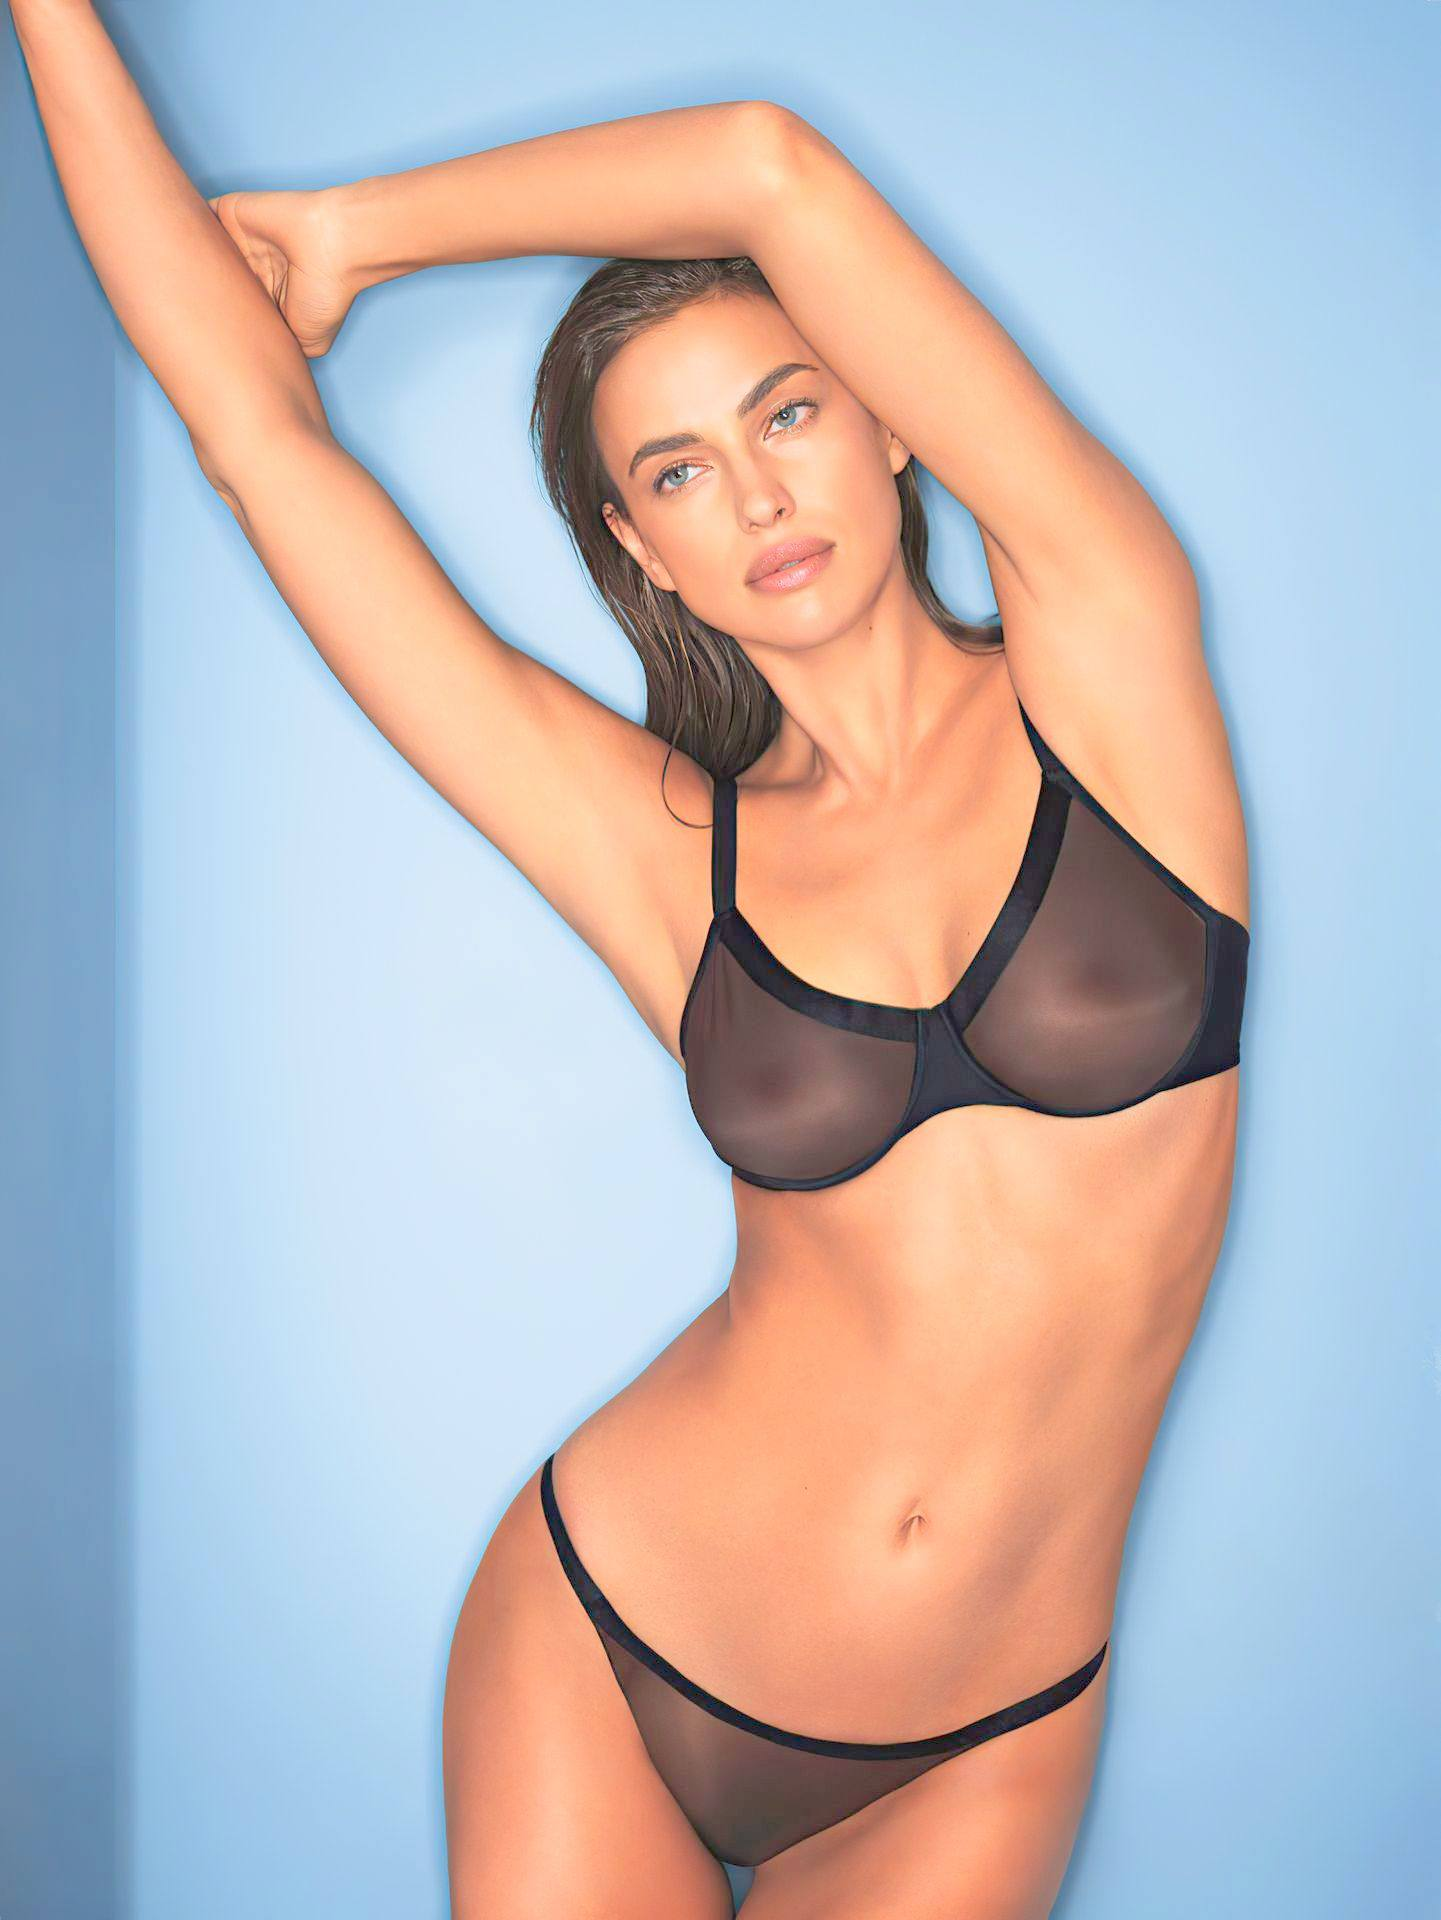 Irina Shayk – Sexy Boobs In Transparent Underwear For Intimissimi Photoshoot (may 2020) 0015